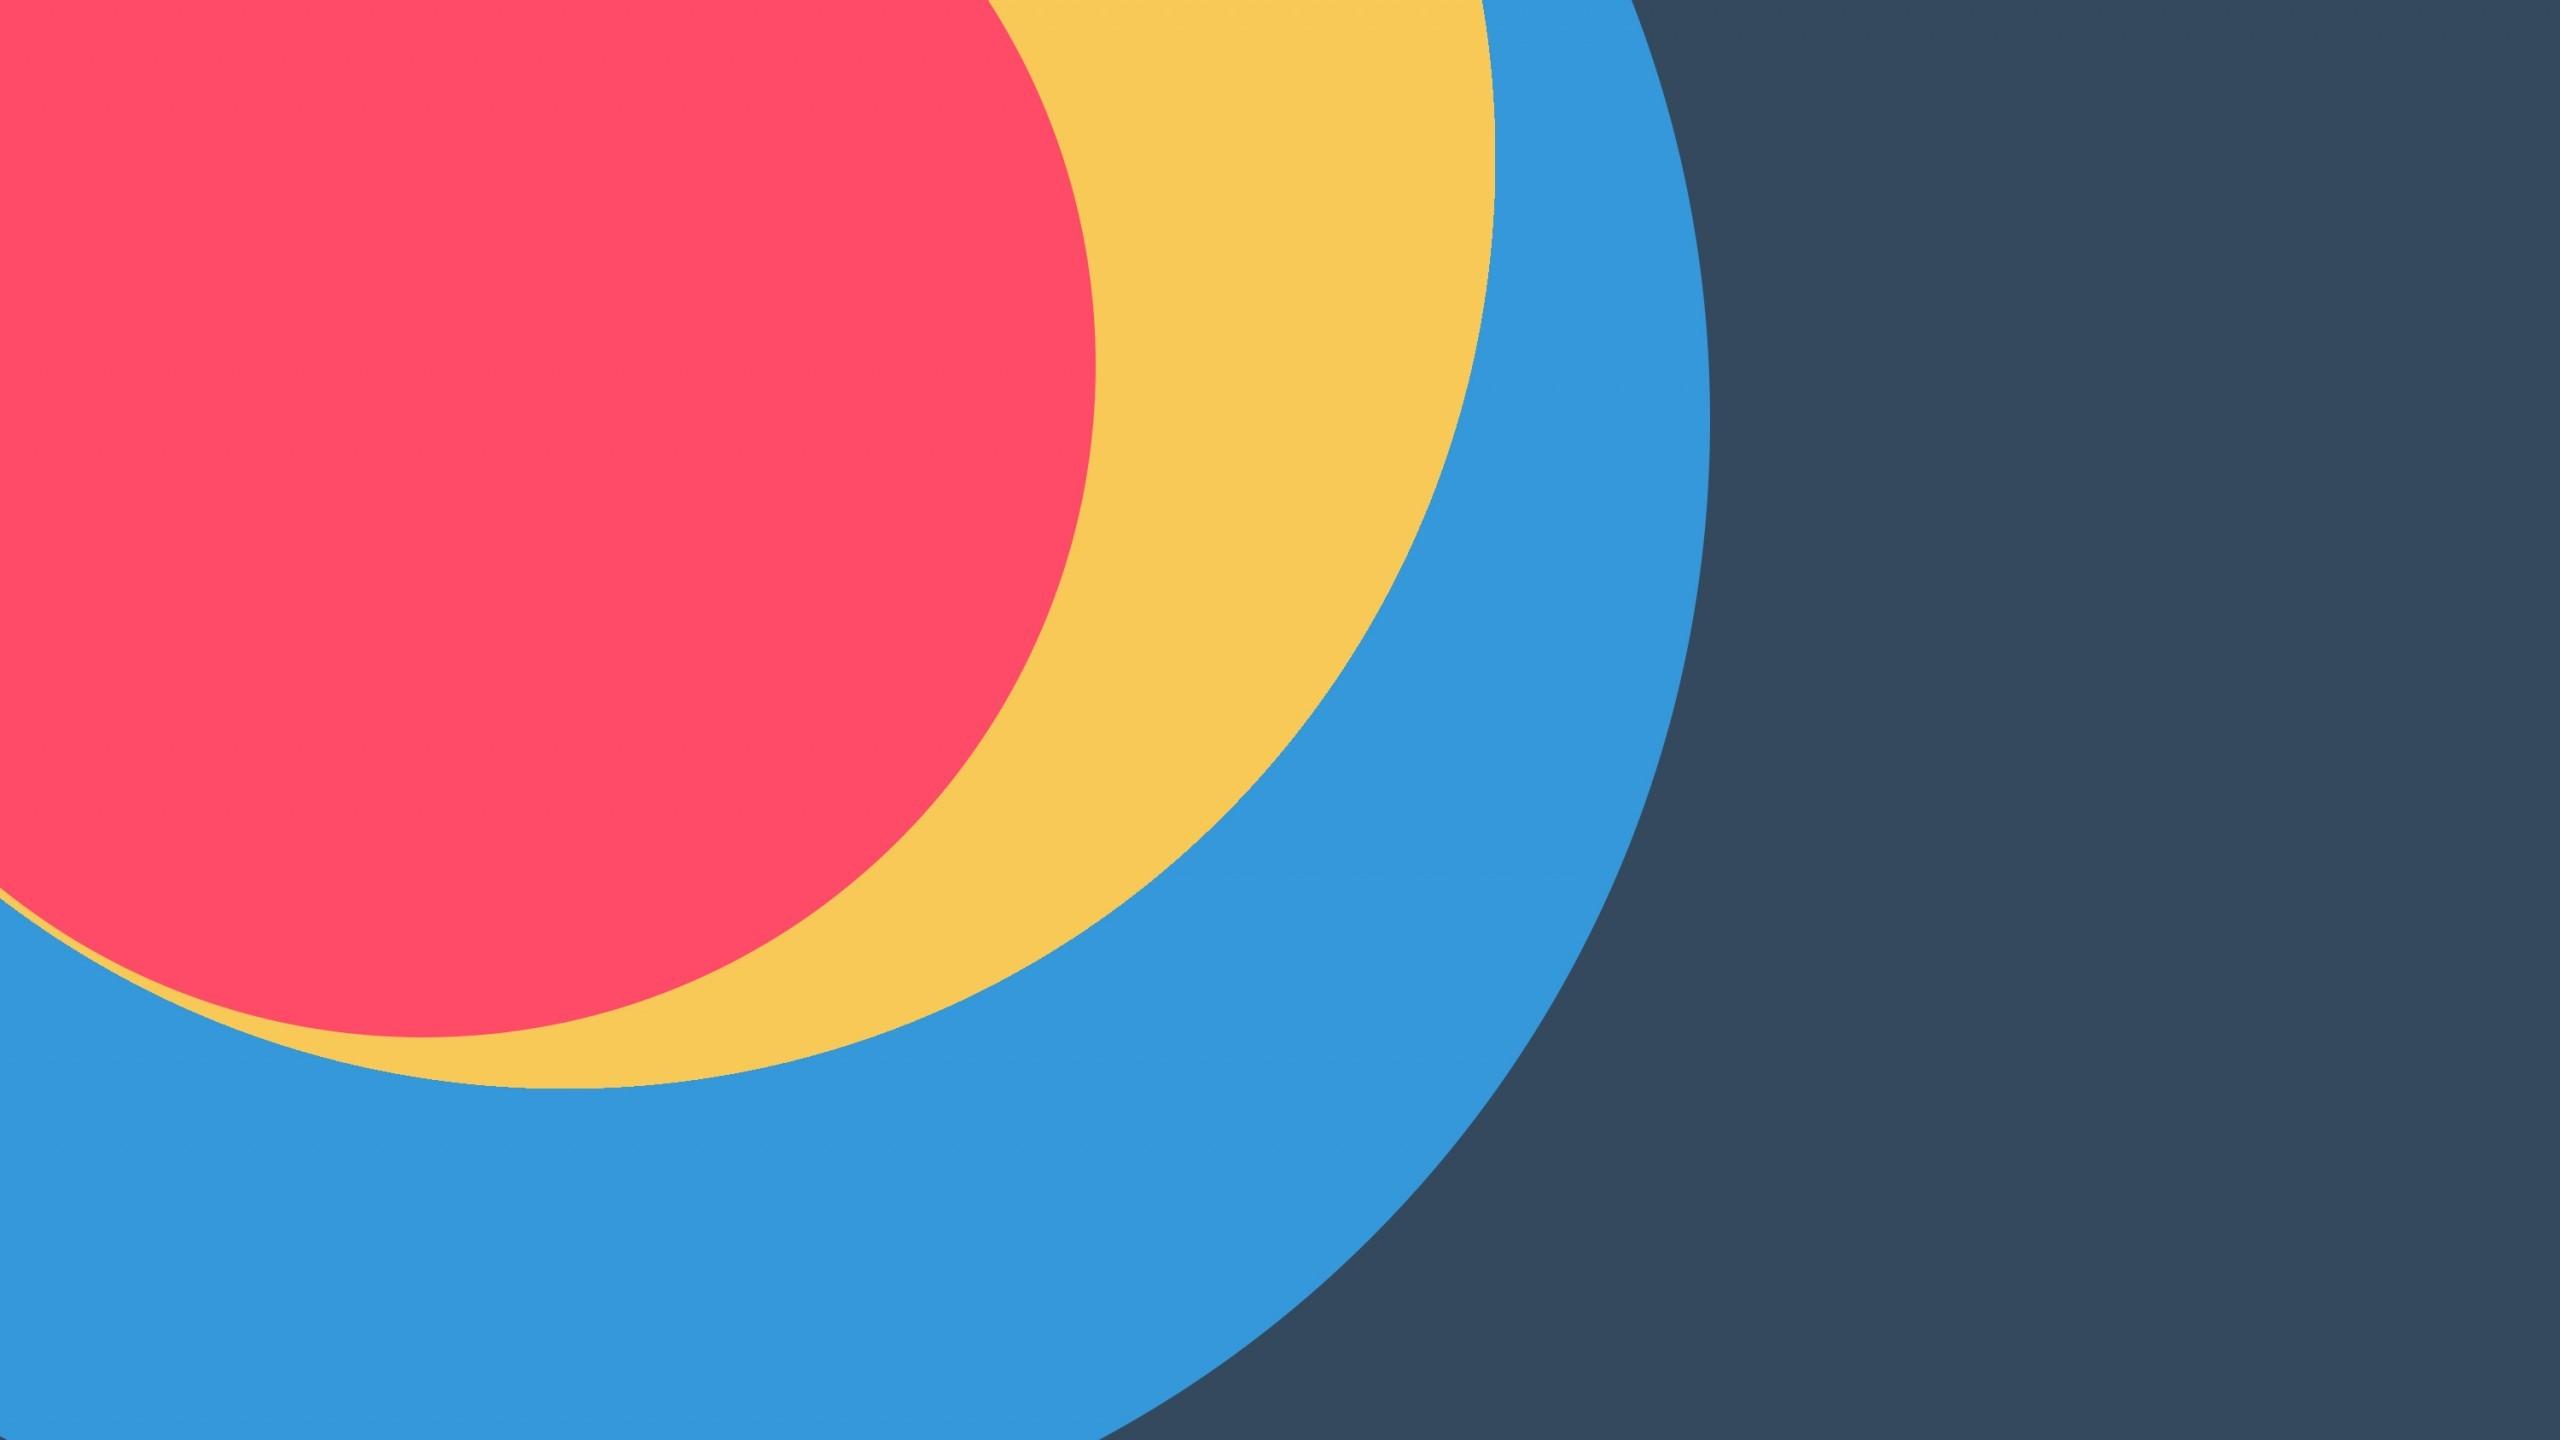 Abstract / Plain colors Wallpaper